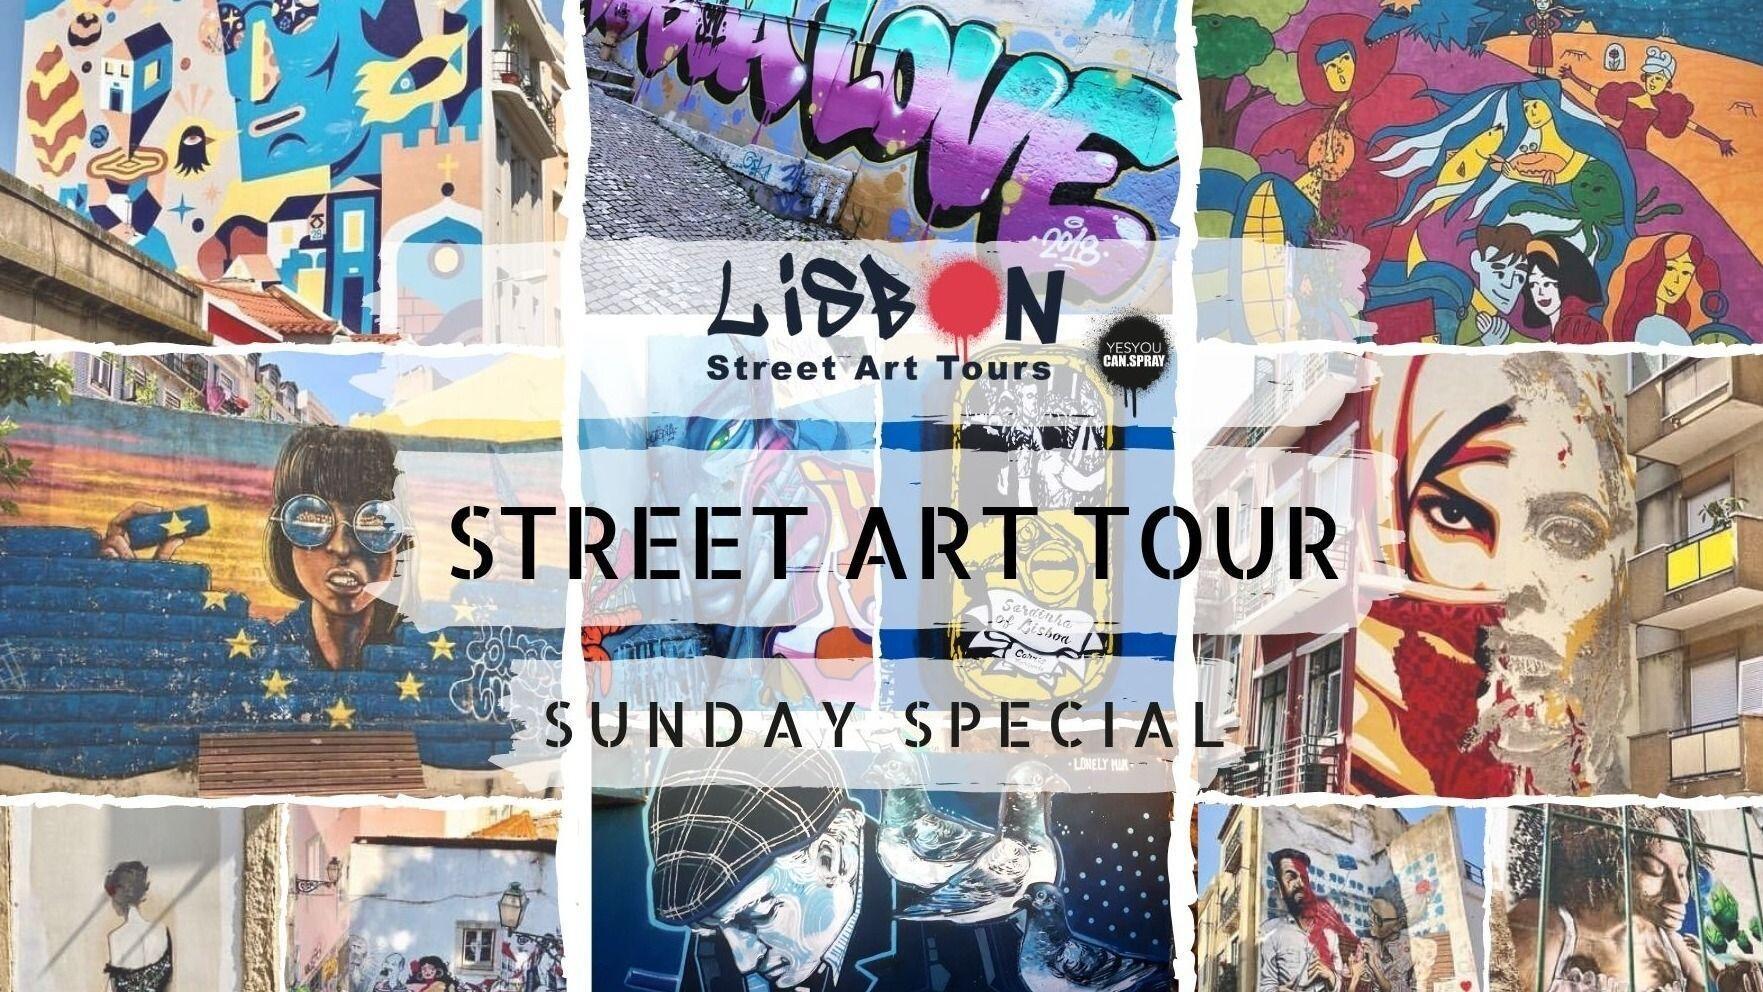 SUNDAY SPECIAL | street art walk & workshop